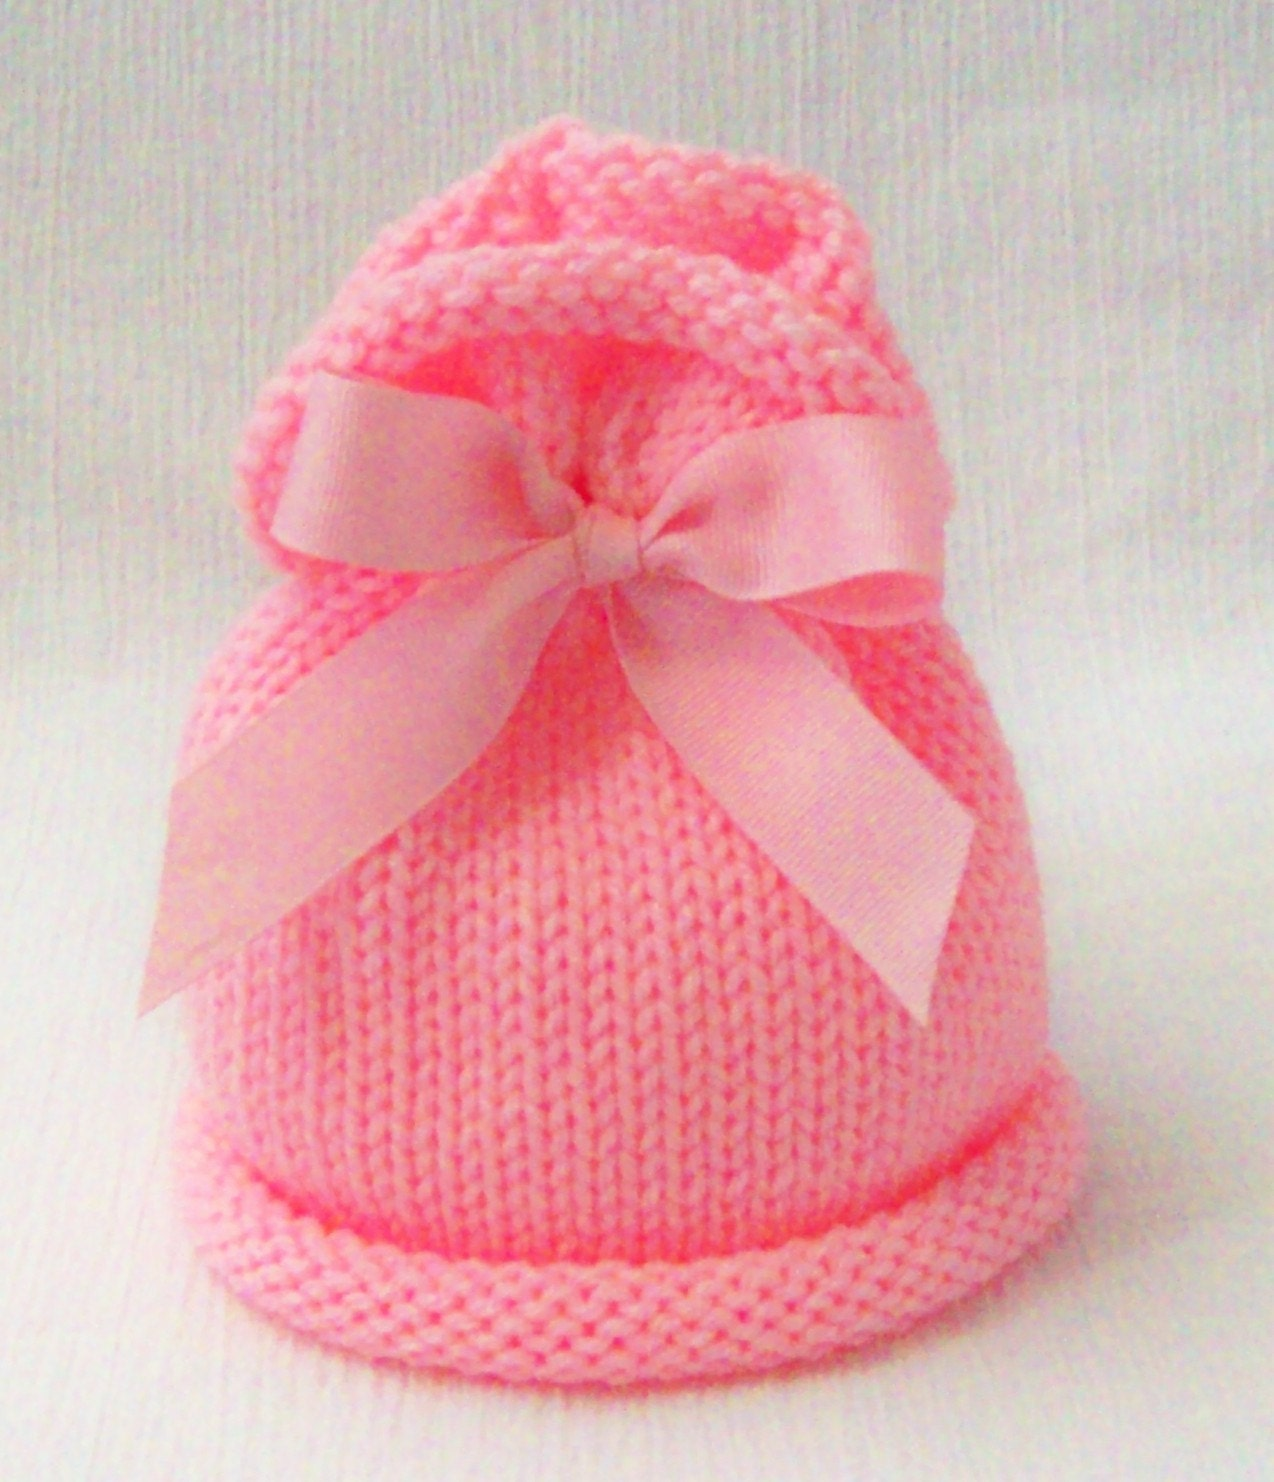 Cute Bow Top Newborn Hat in Petal  Pink Knit Photo Prop